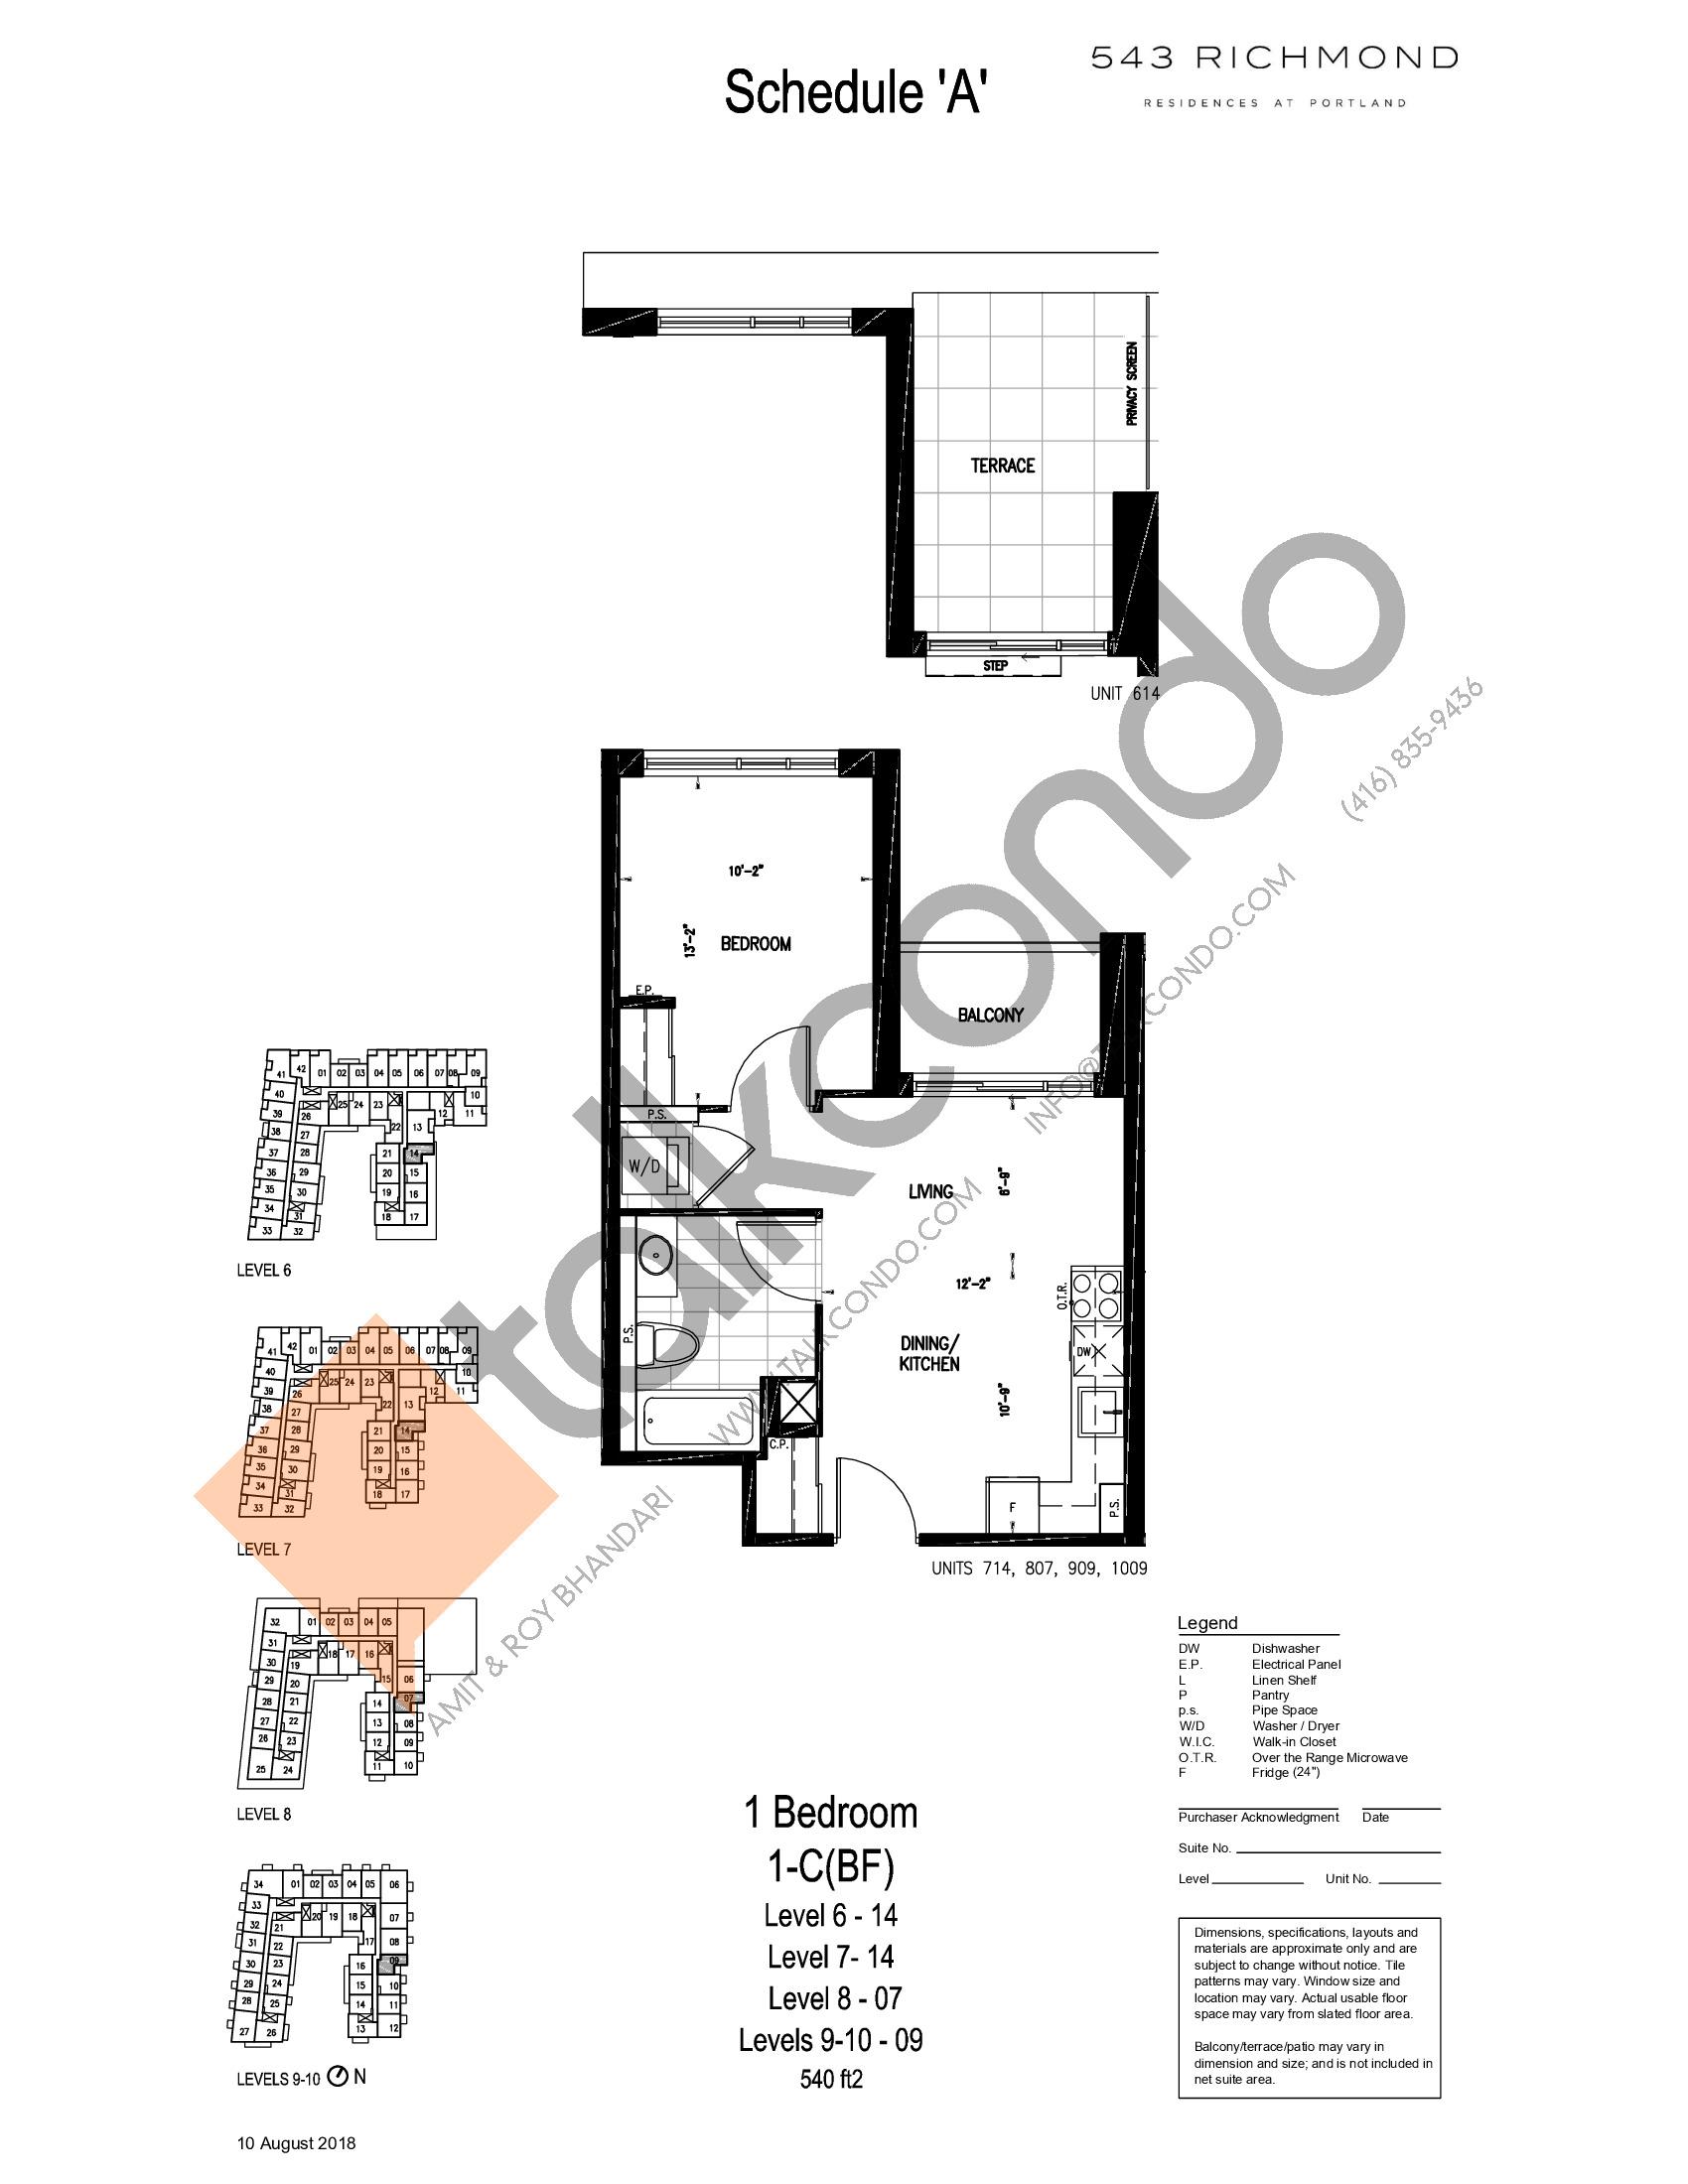 1-C(BF) Floor Plan at 543 Richmond St Condos - 540 sq.ft